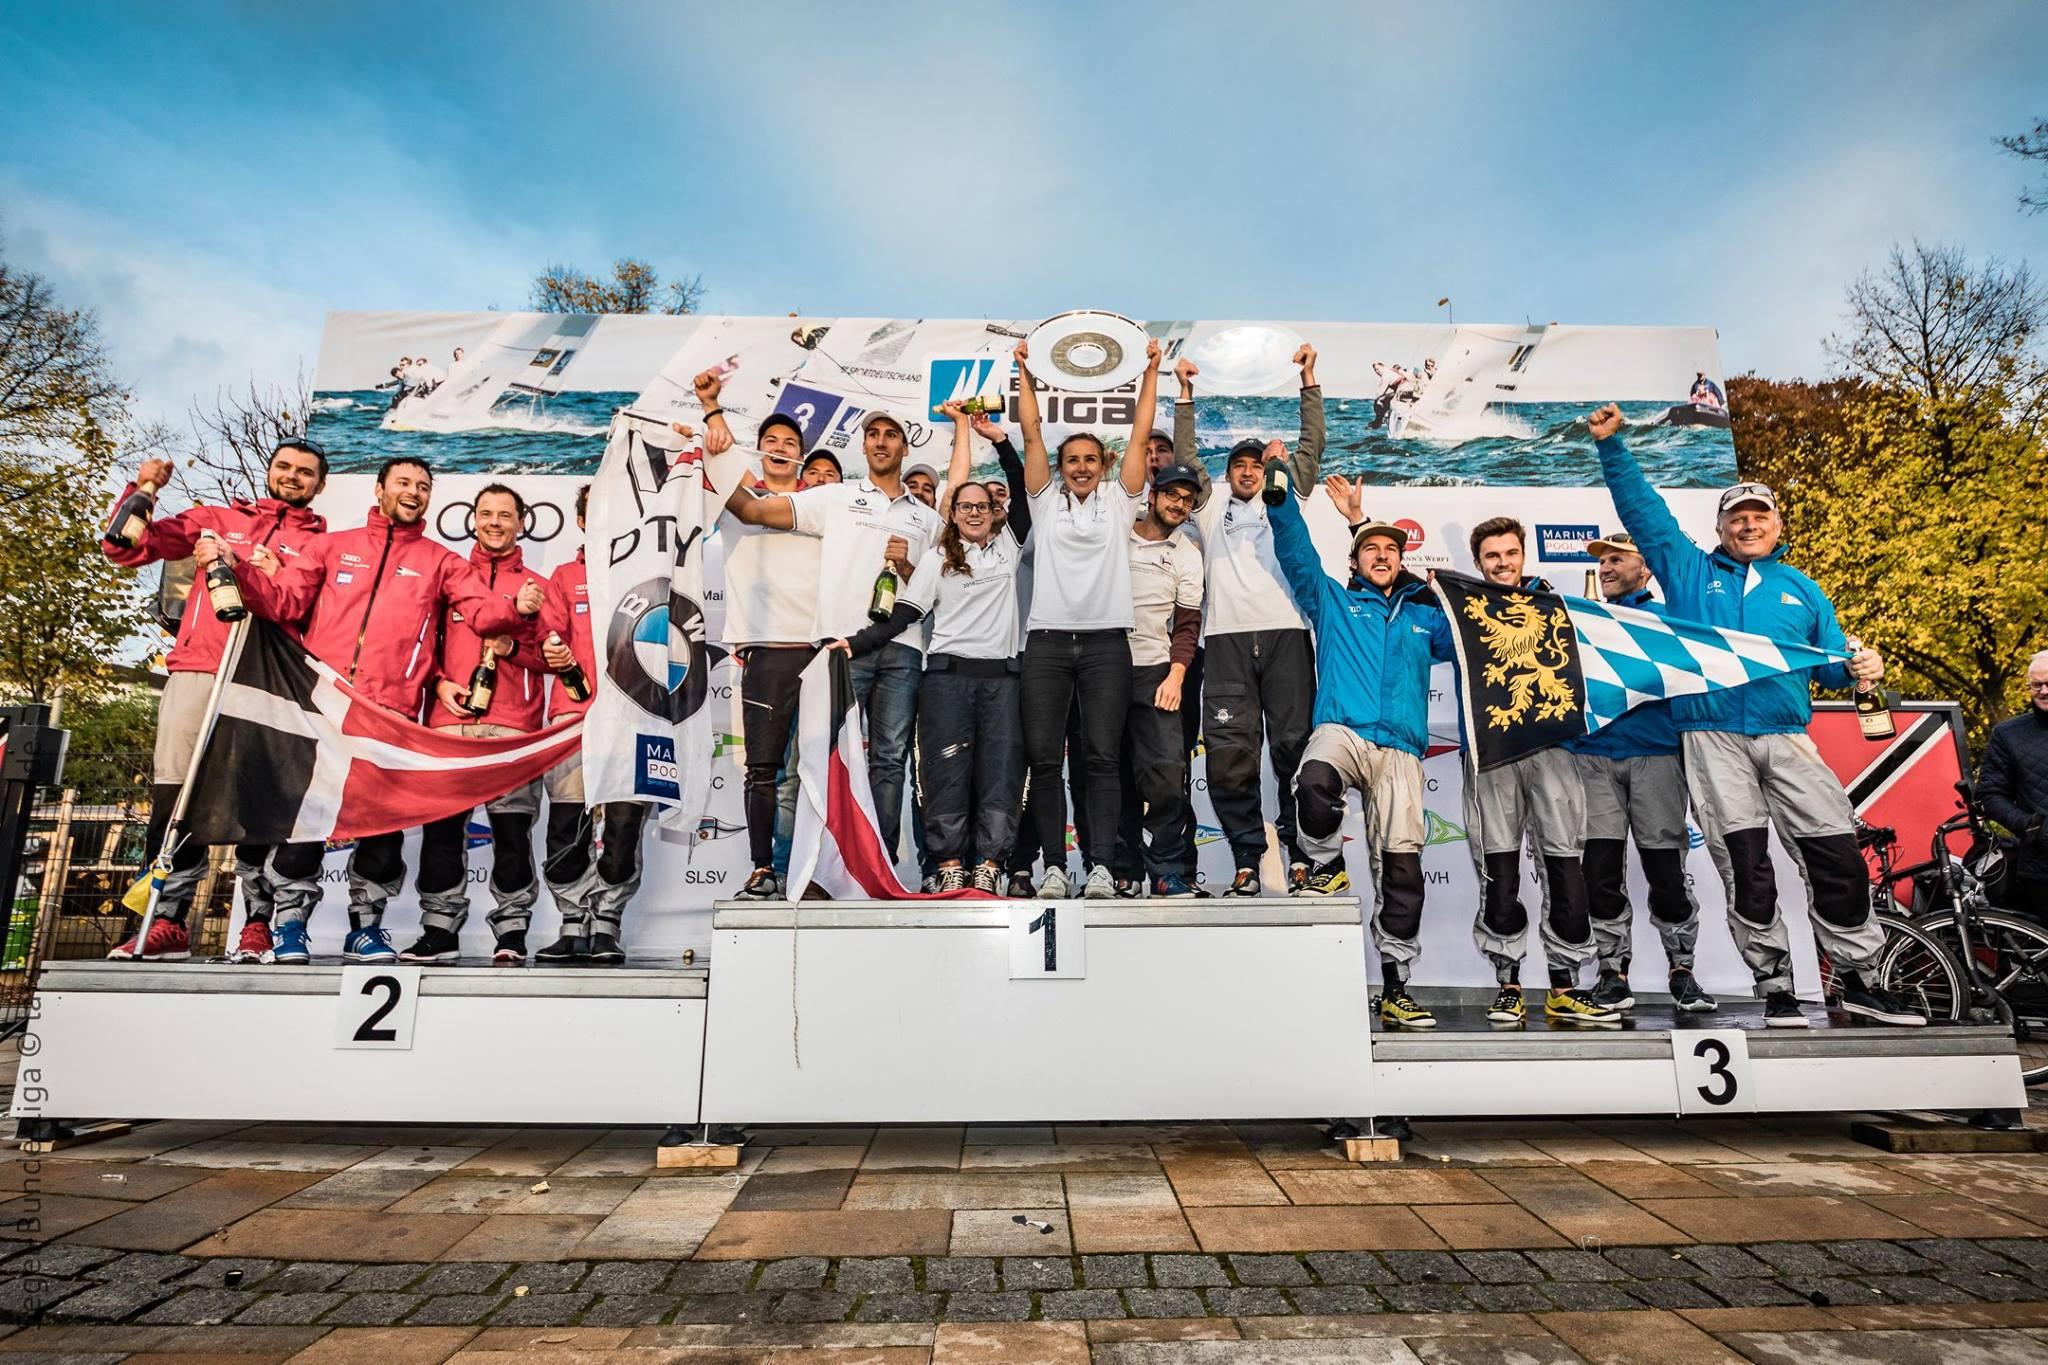 Team BYC: Philipp Hibler, Andi Plettner, Andi Achterberg, Maxi Hibler